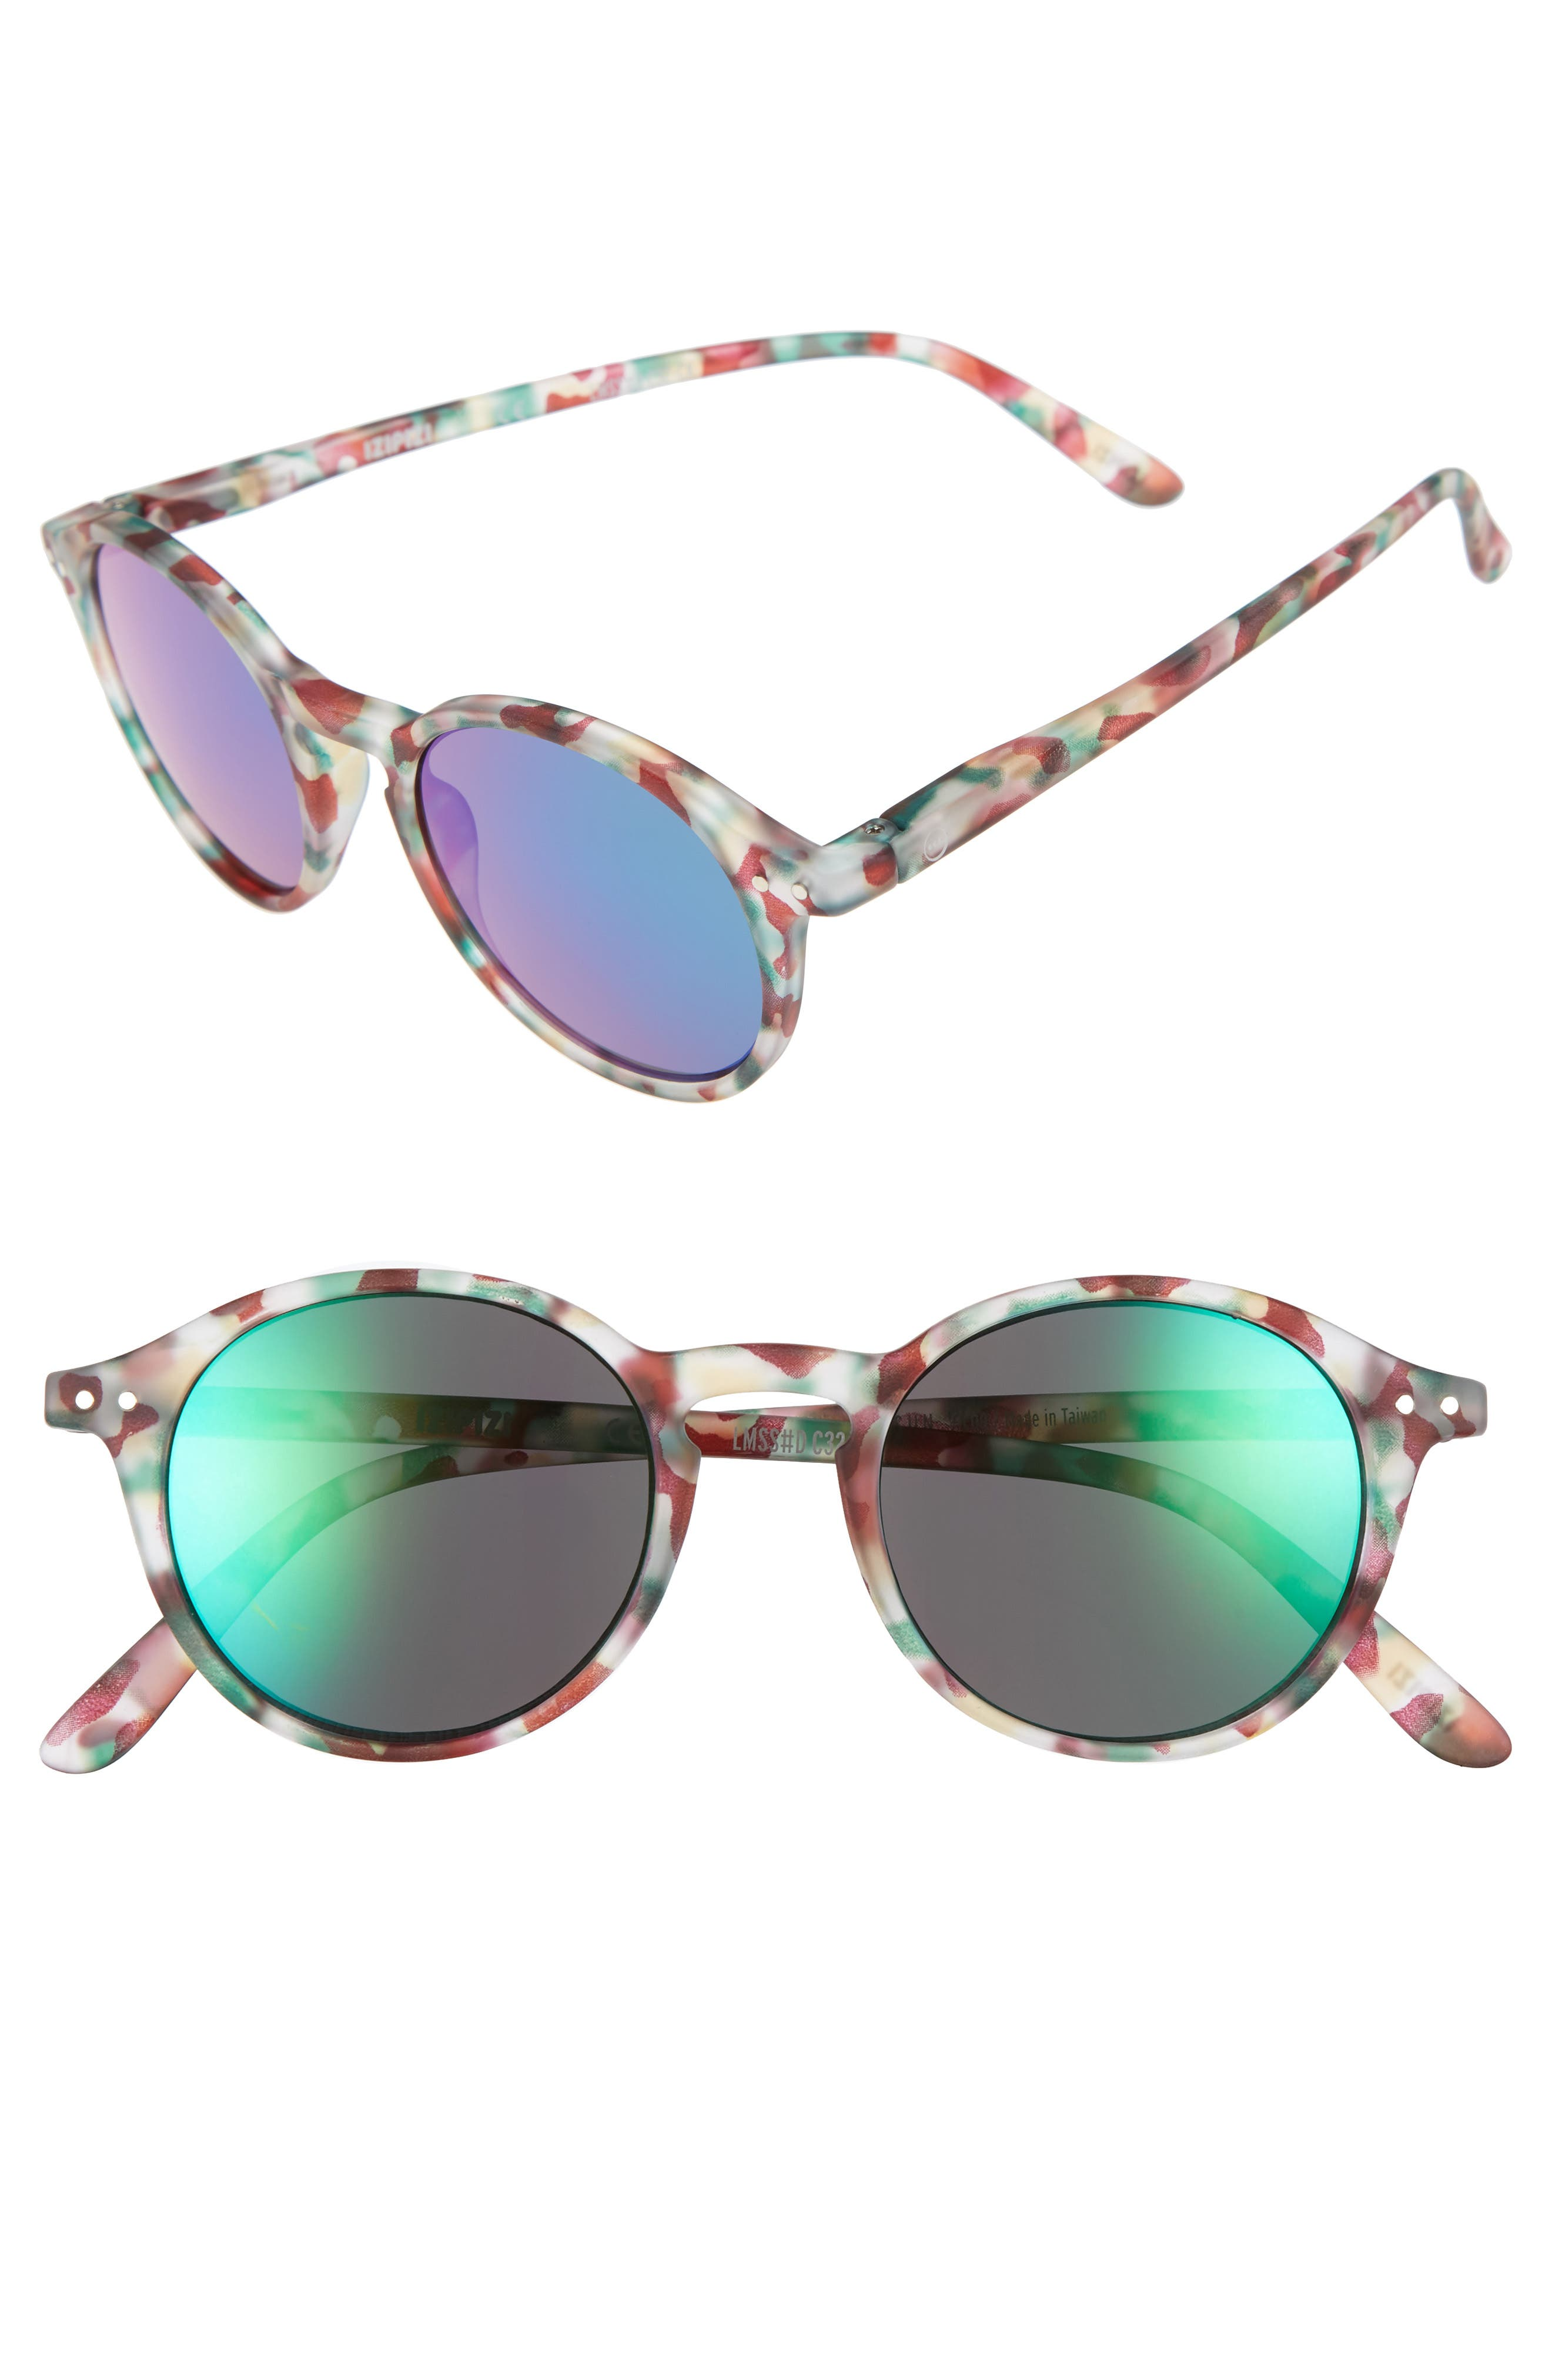 Izipizi 46mm Mirrored Sunglasses